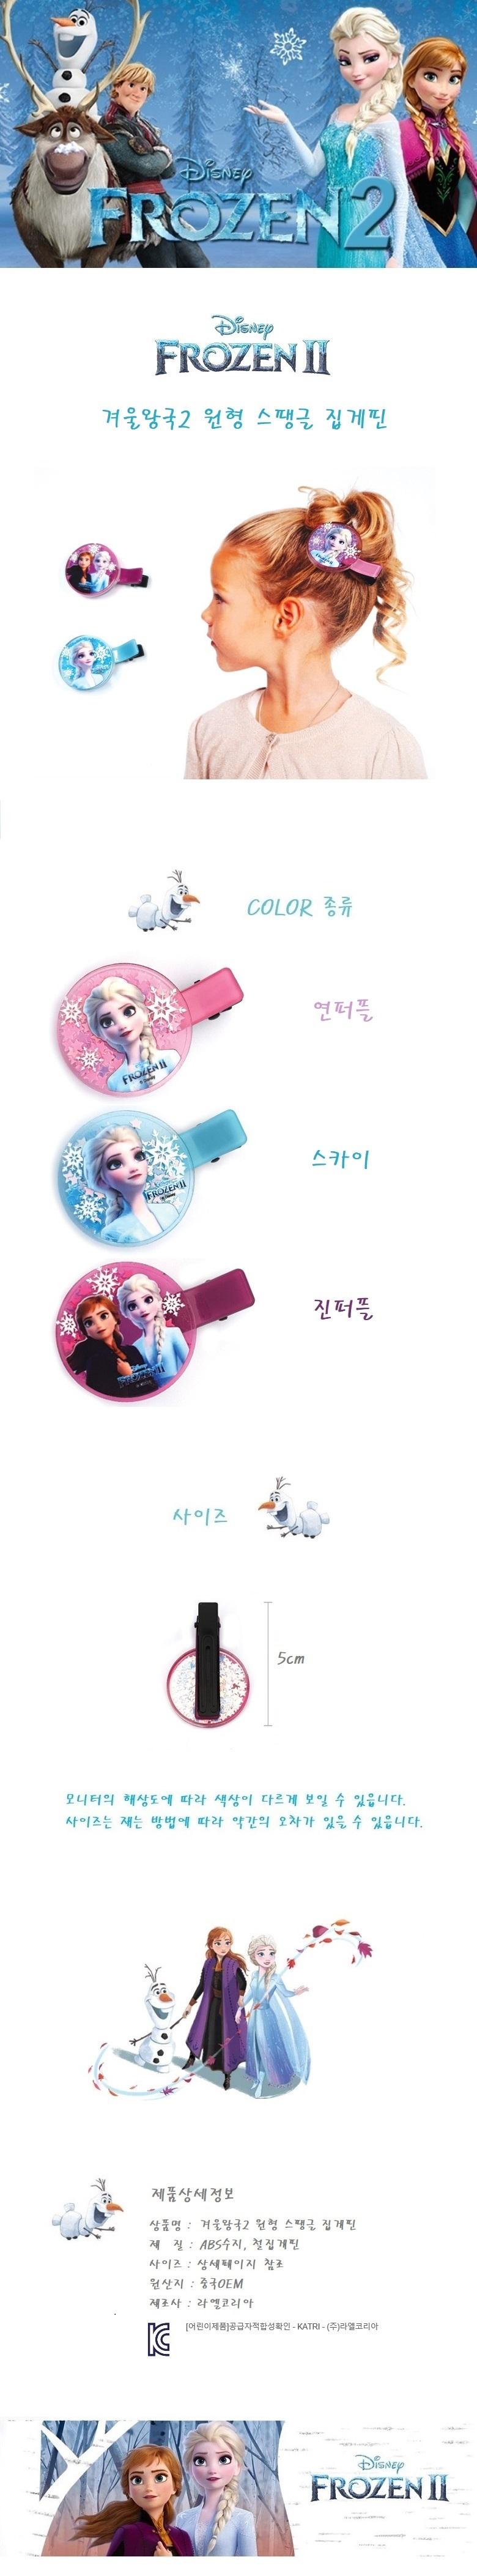 frozen2_wonspanglepin.jpg